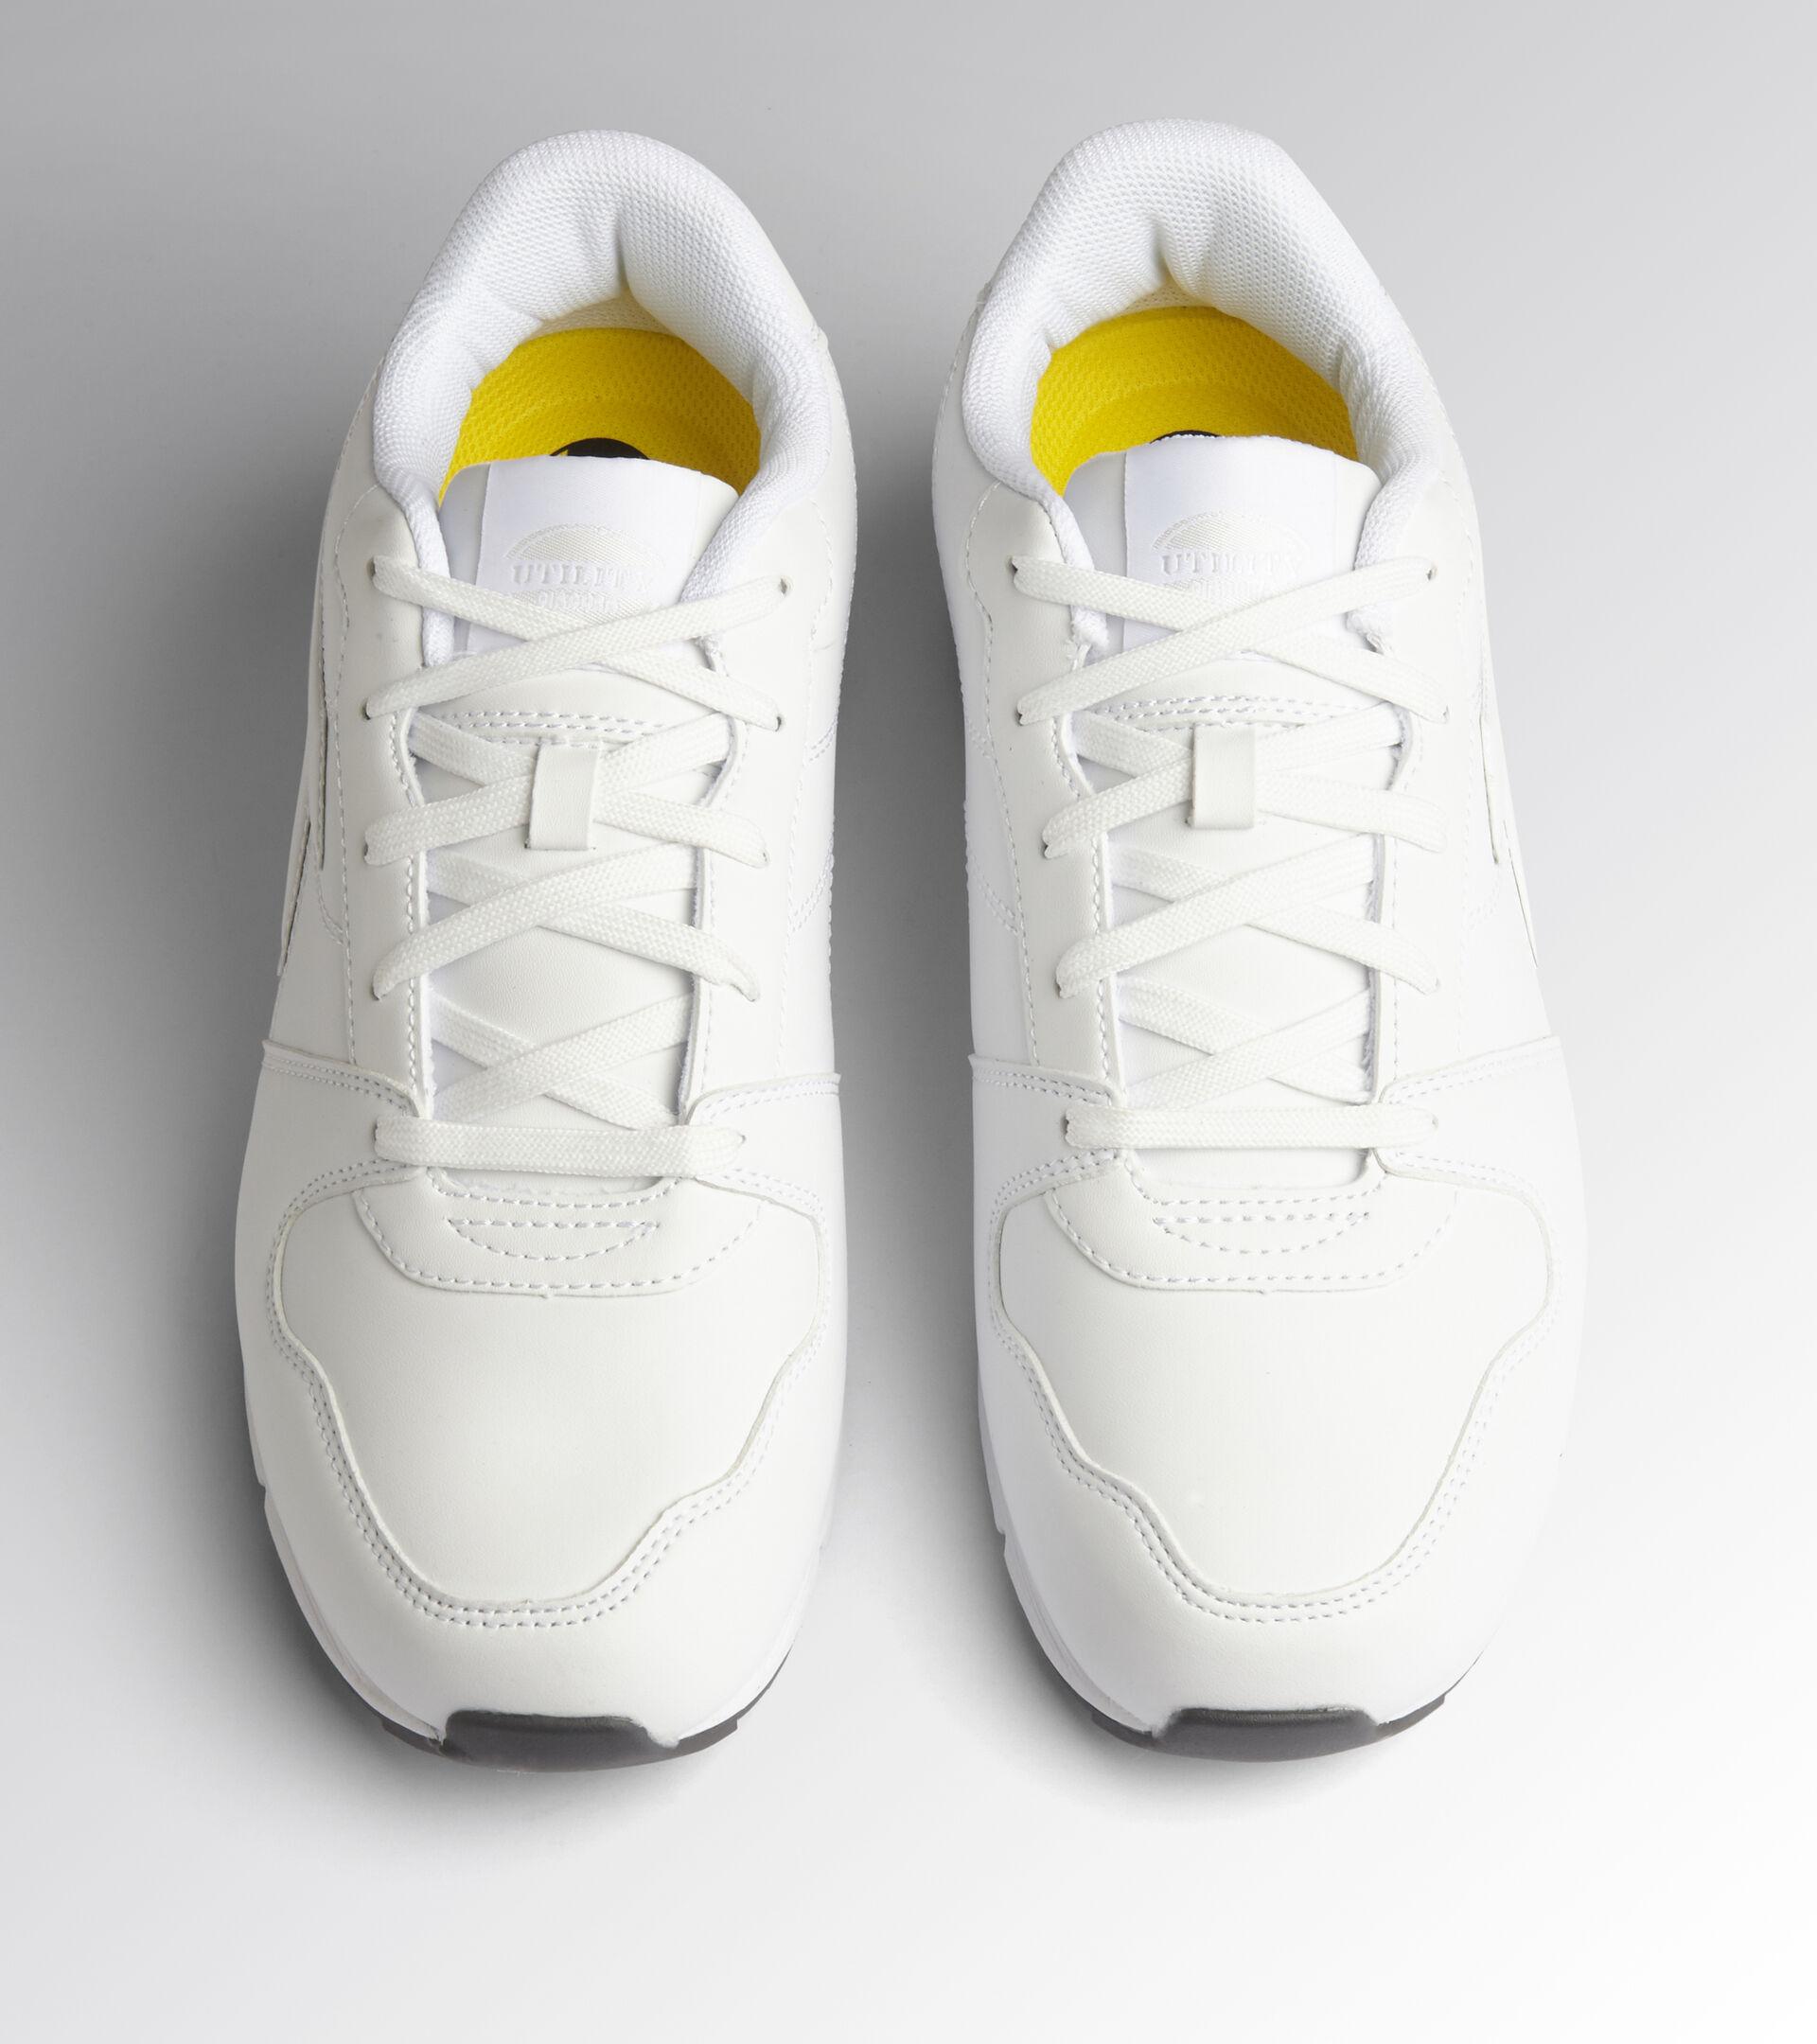 Footwear Utility UNISEX CREW MICRO OB SRC WHITE Utility